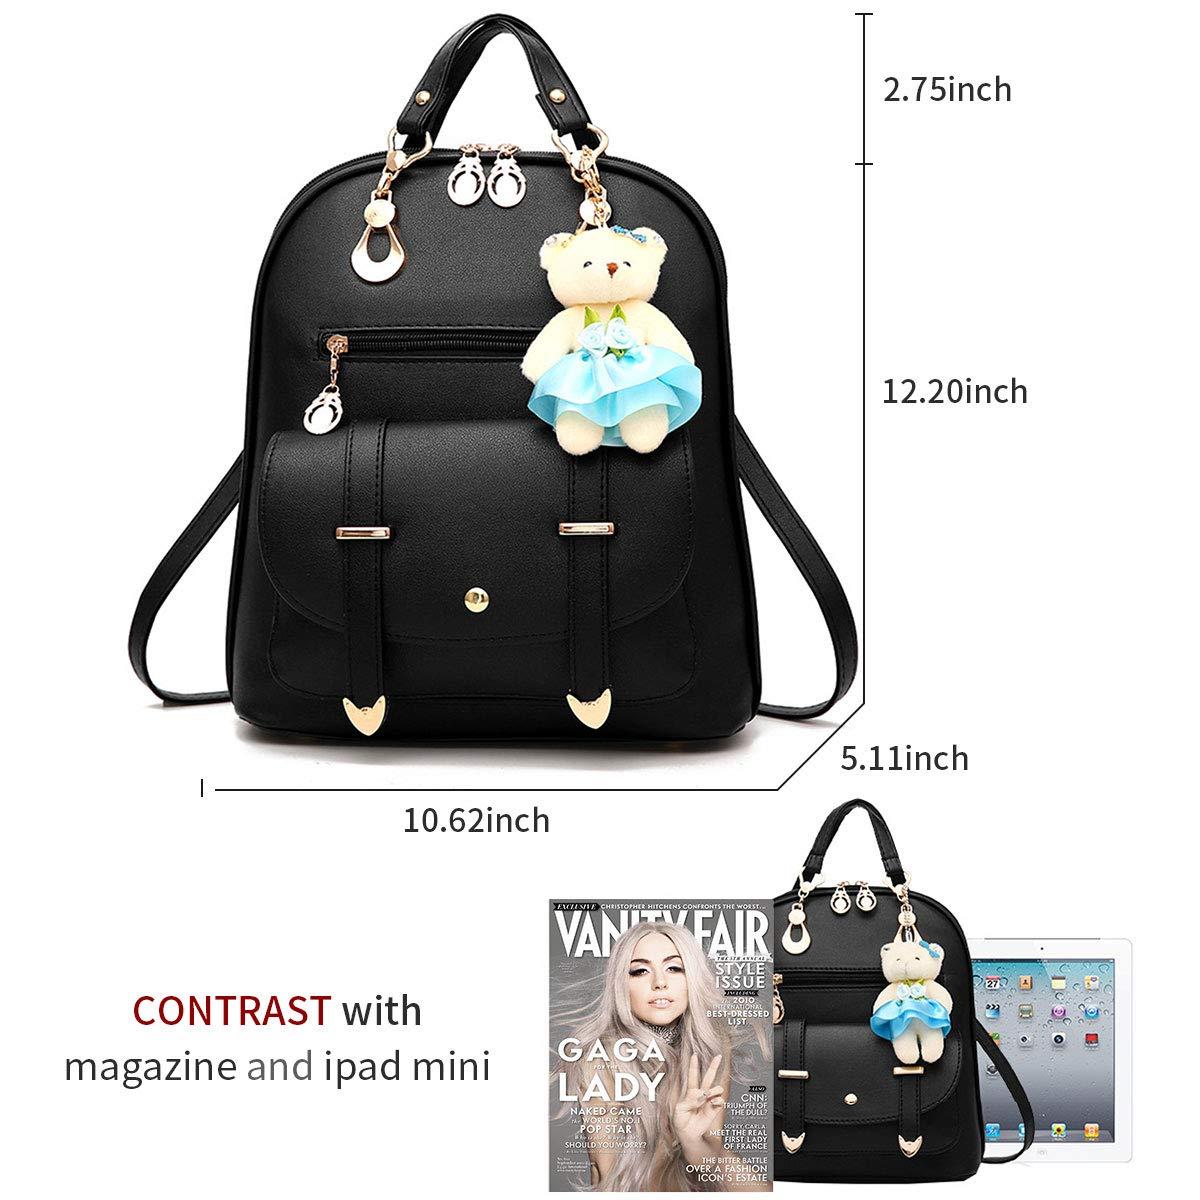 1e136a7efe1 Backpack Purse for Women Large Capacity Cute Mini Backpack for Girls Pu  Leather Bags,Burgundy